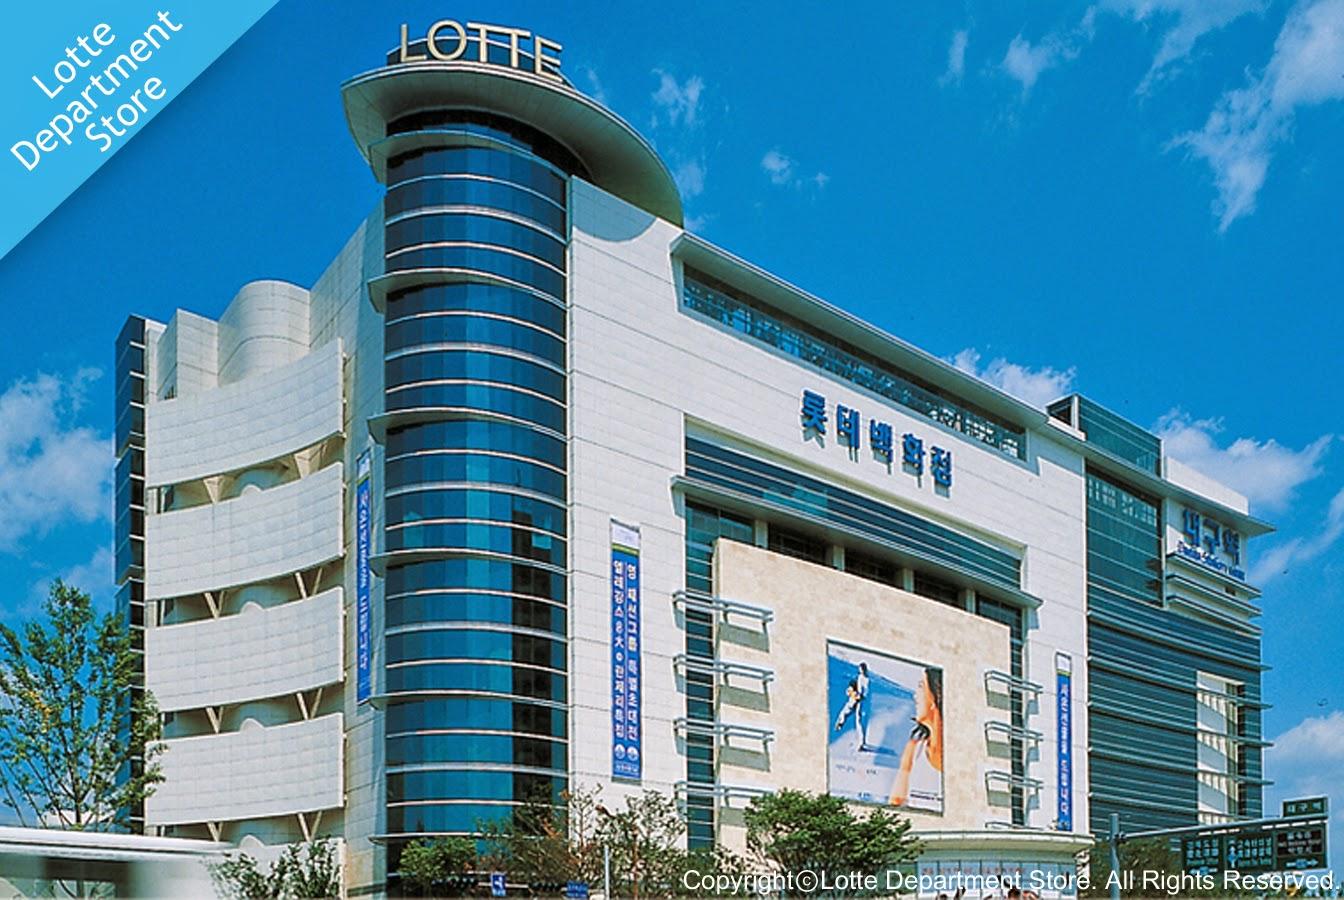 Shopping Areas in Daegu-Lotte Department Store in Daegu Station, Buk-gu